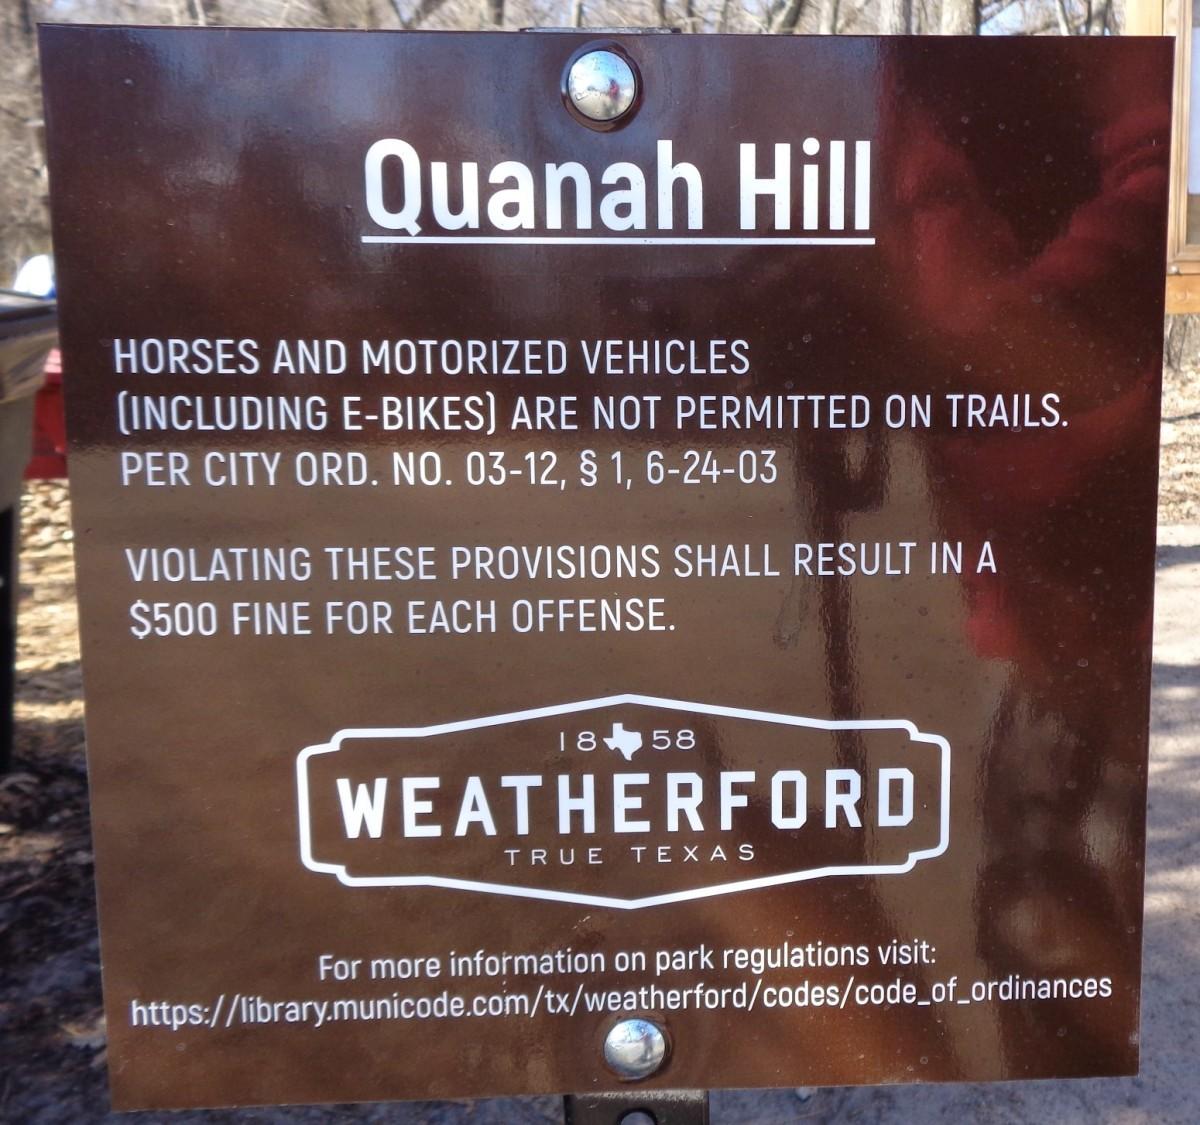 Quanah Hill